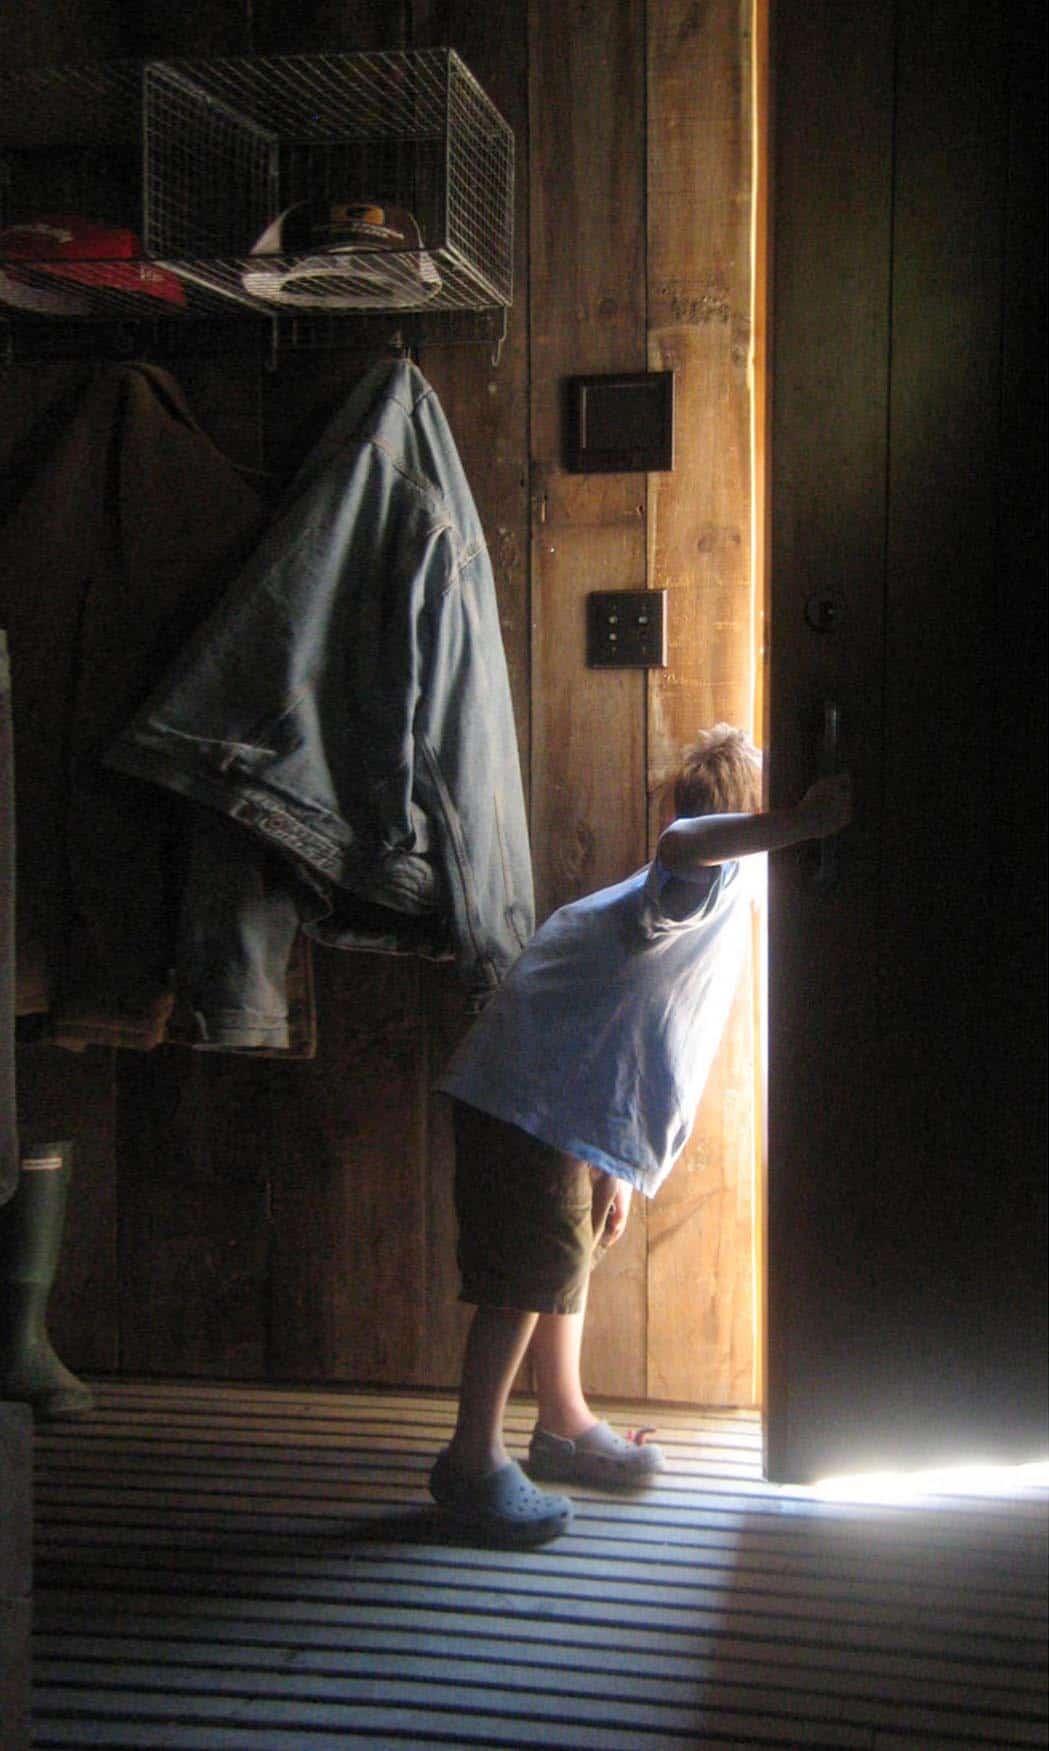 barn-rustic-entry